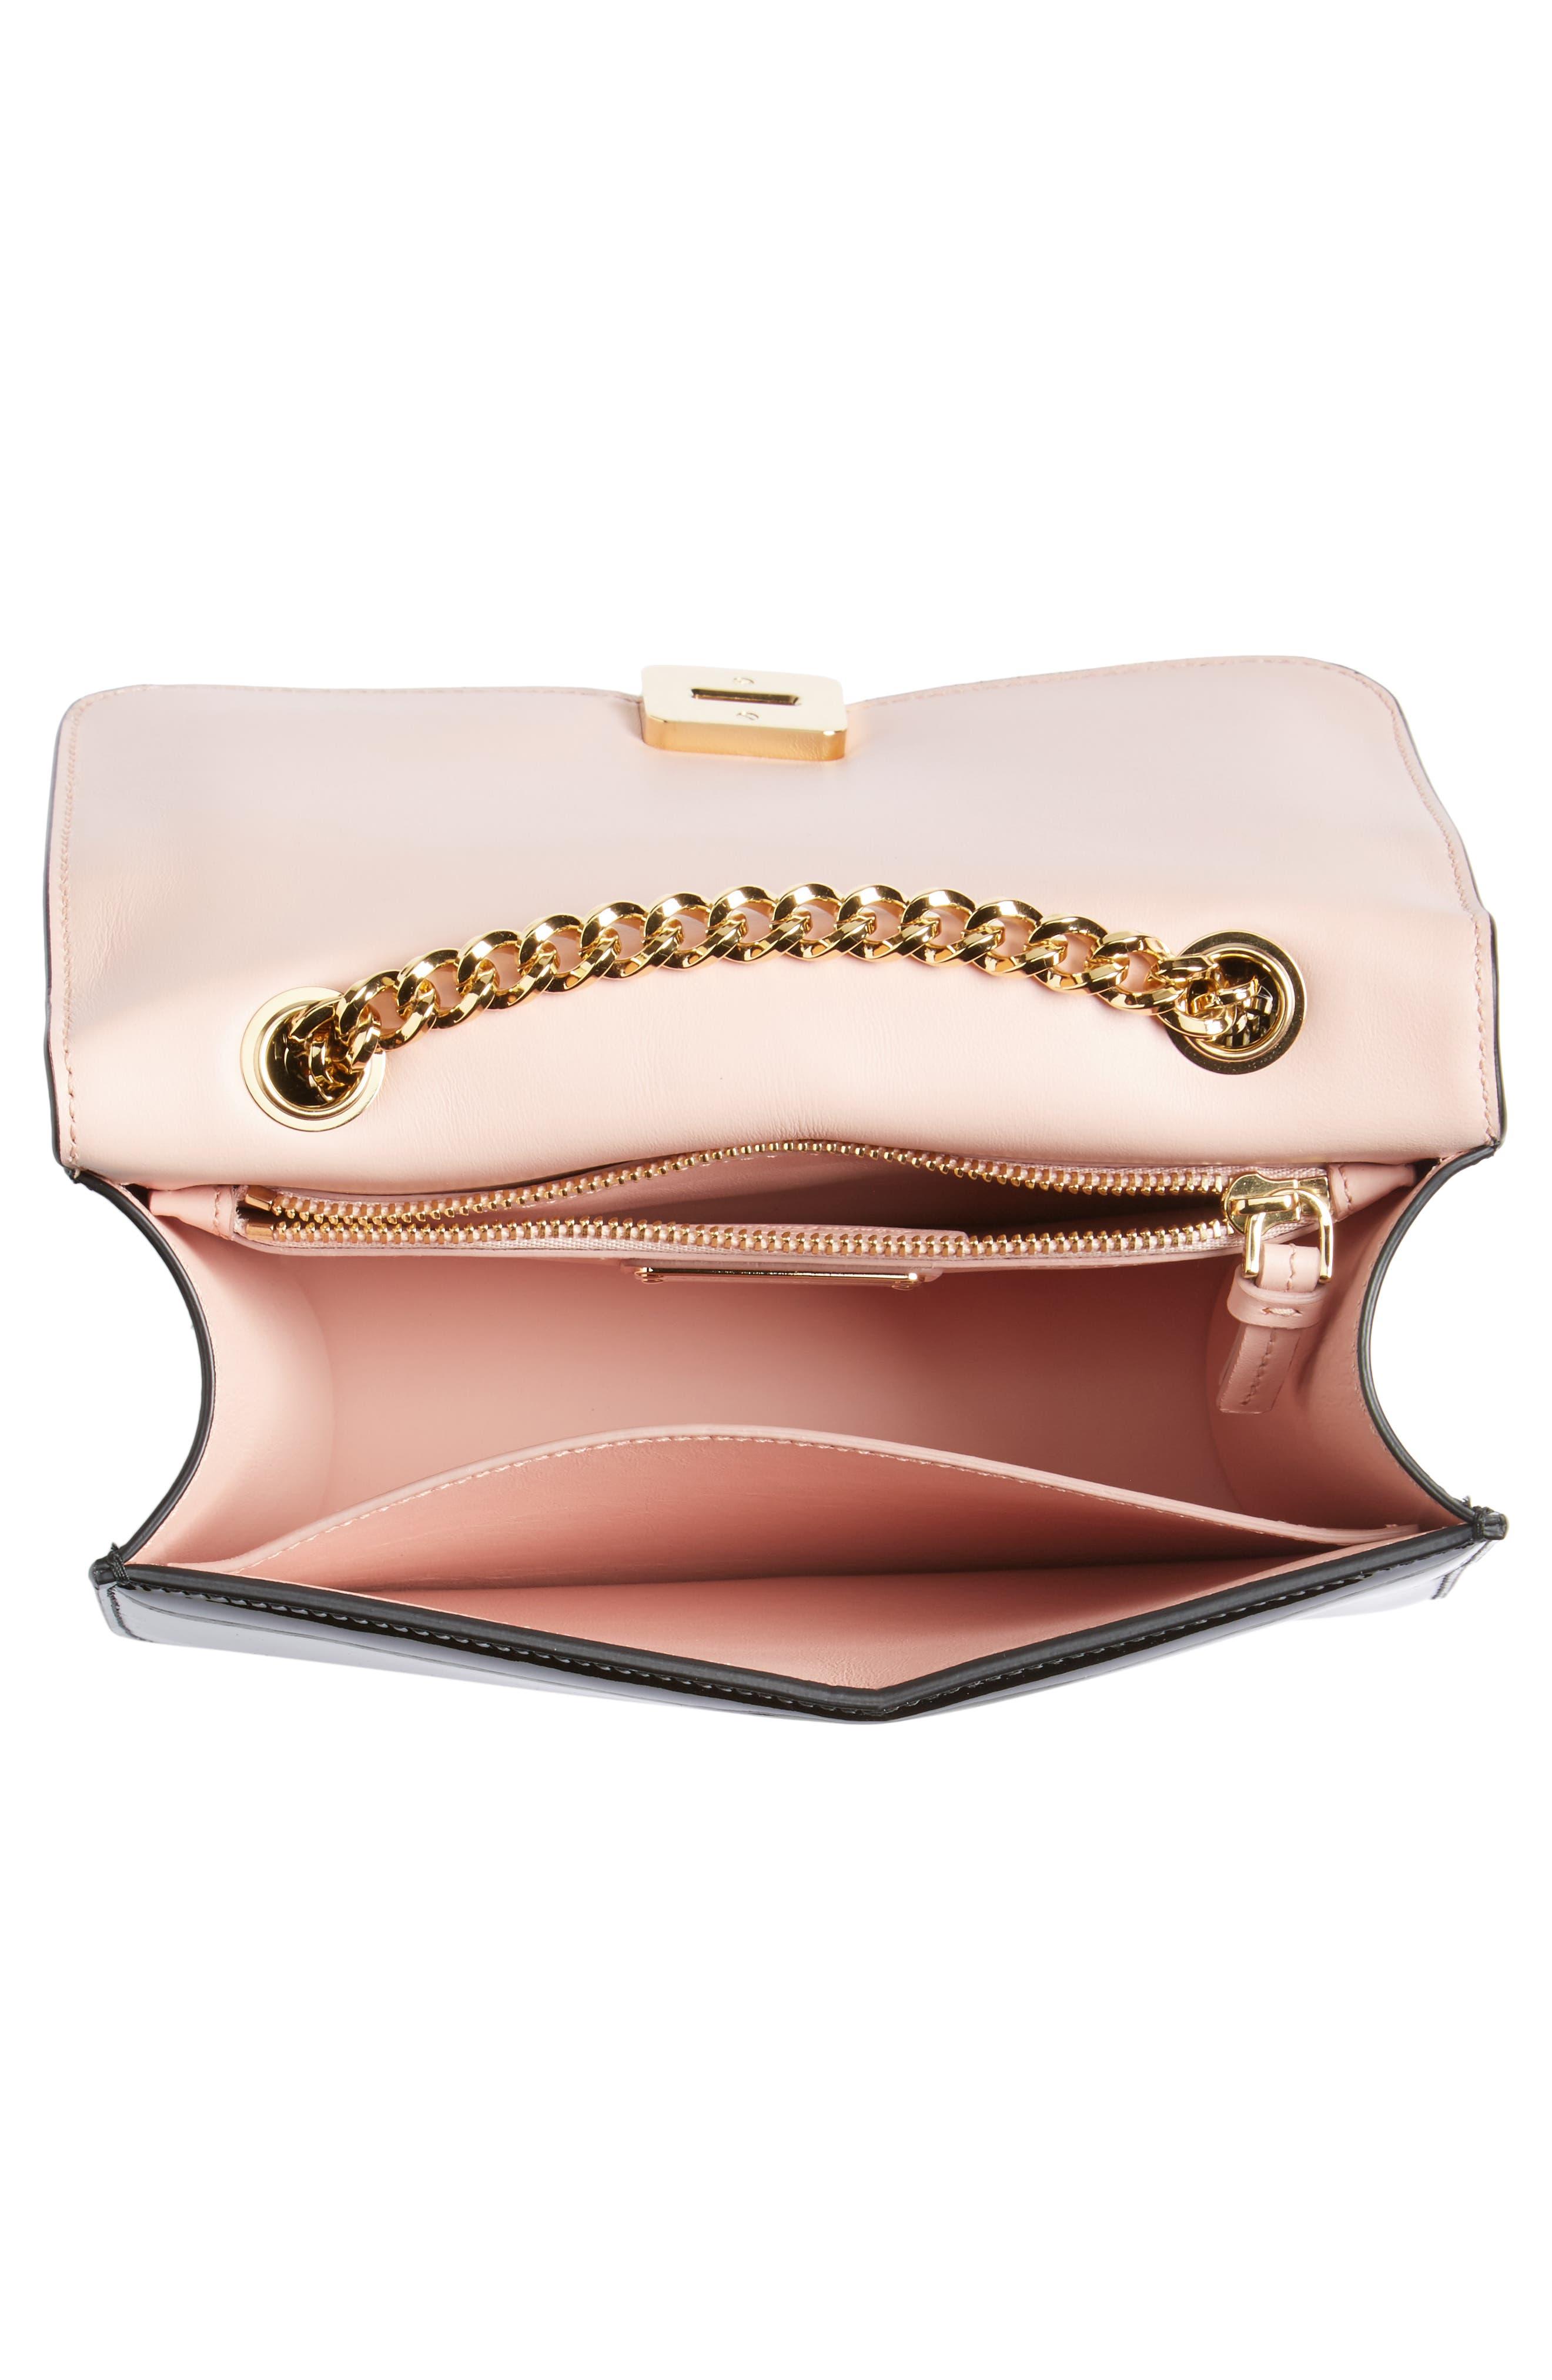 Vara Patent Leather Shoulder Bag,                             Alternate thumbnail 4, color,                             Nero/ Bonbon